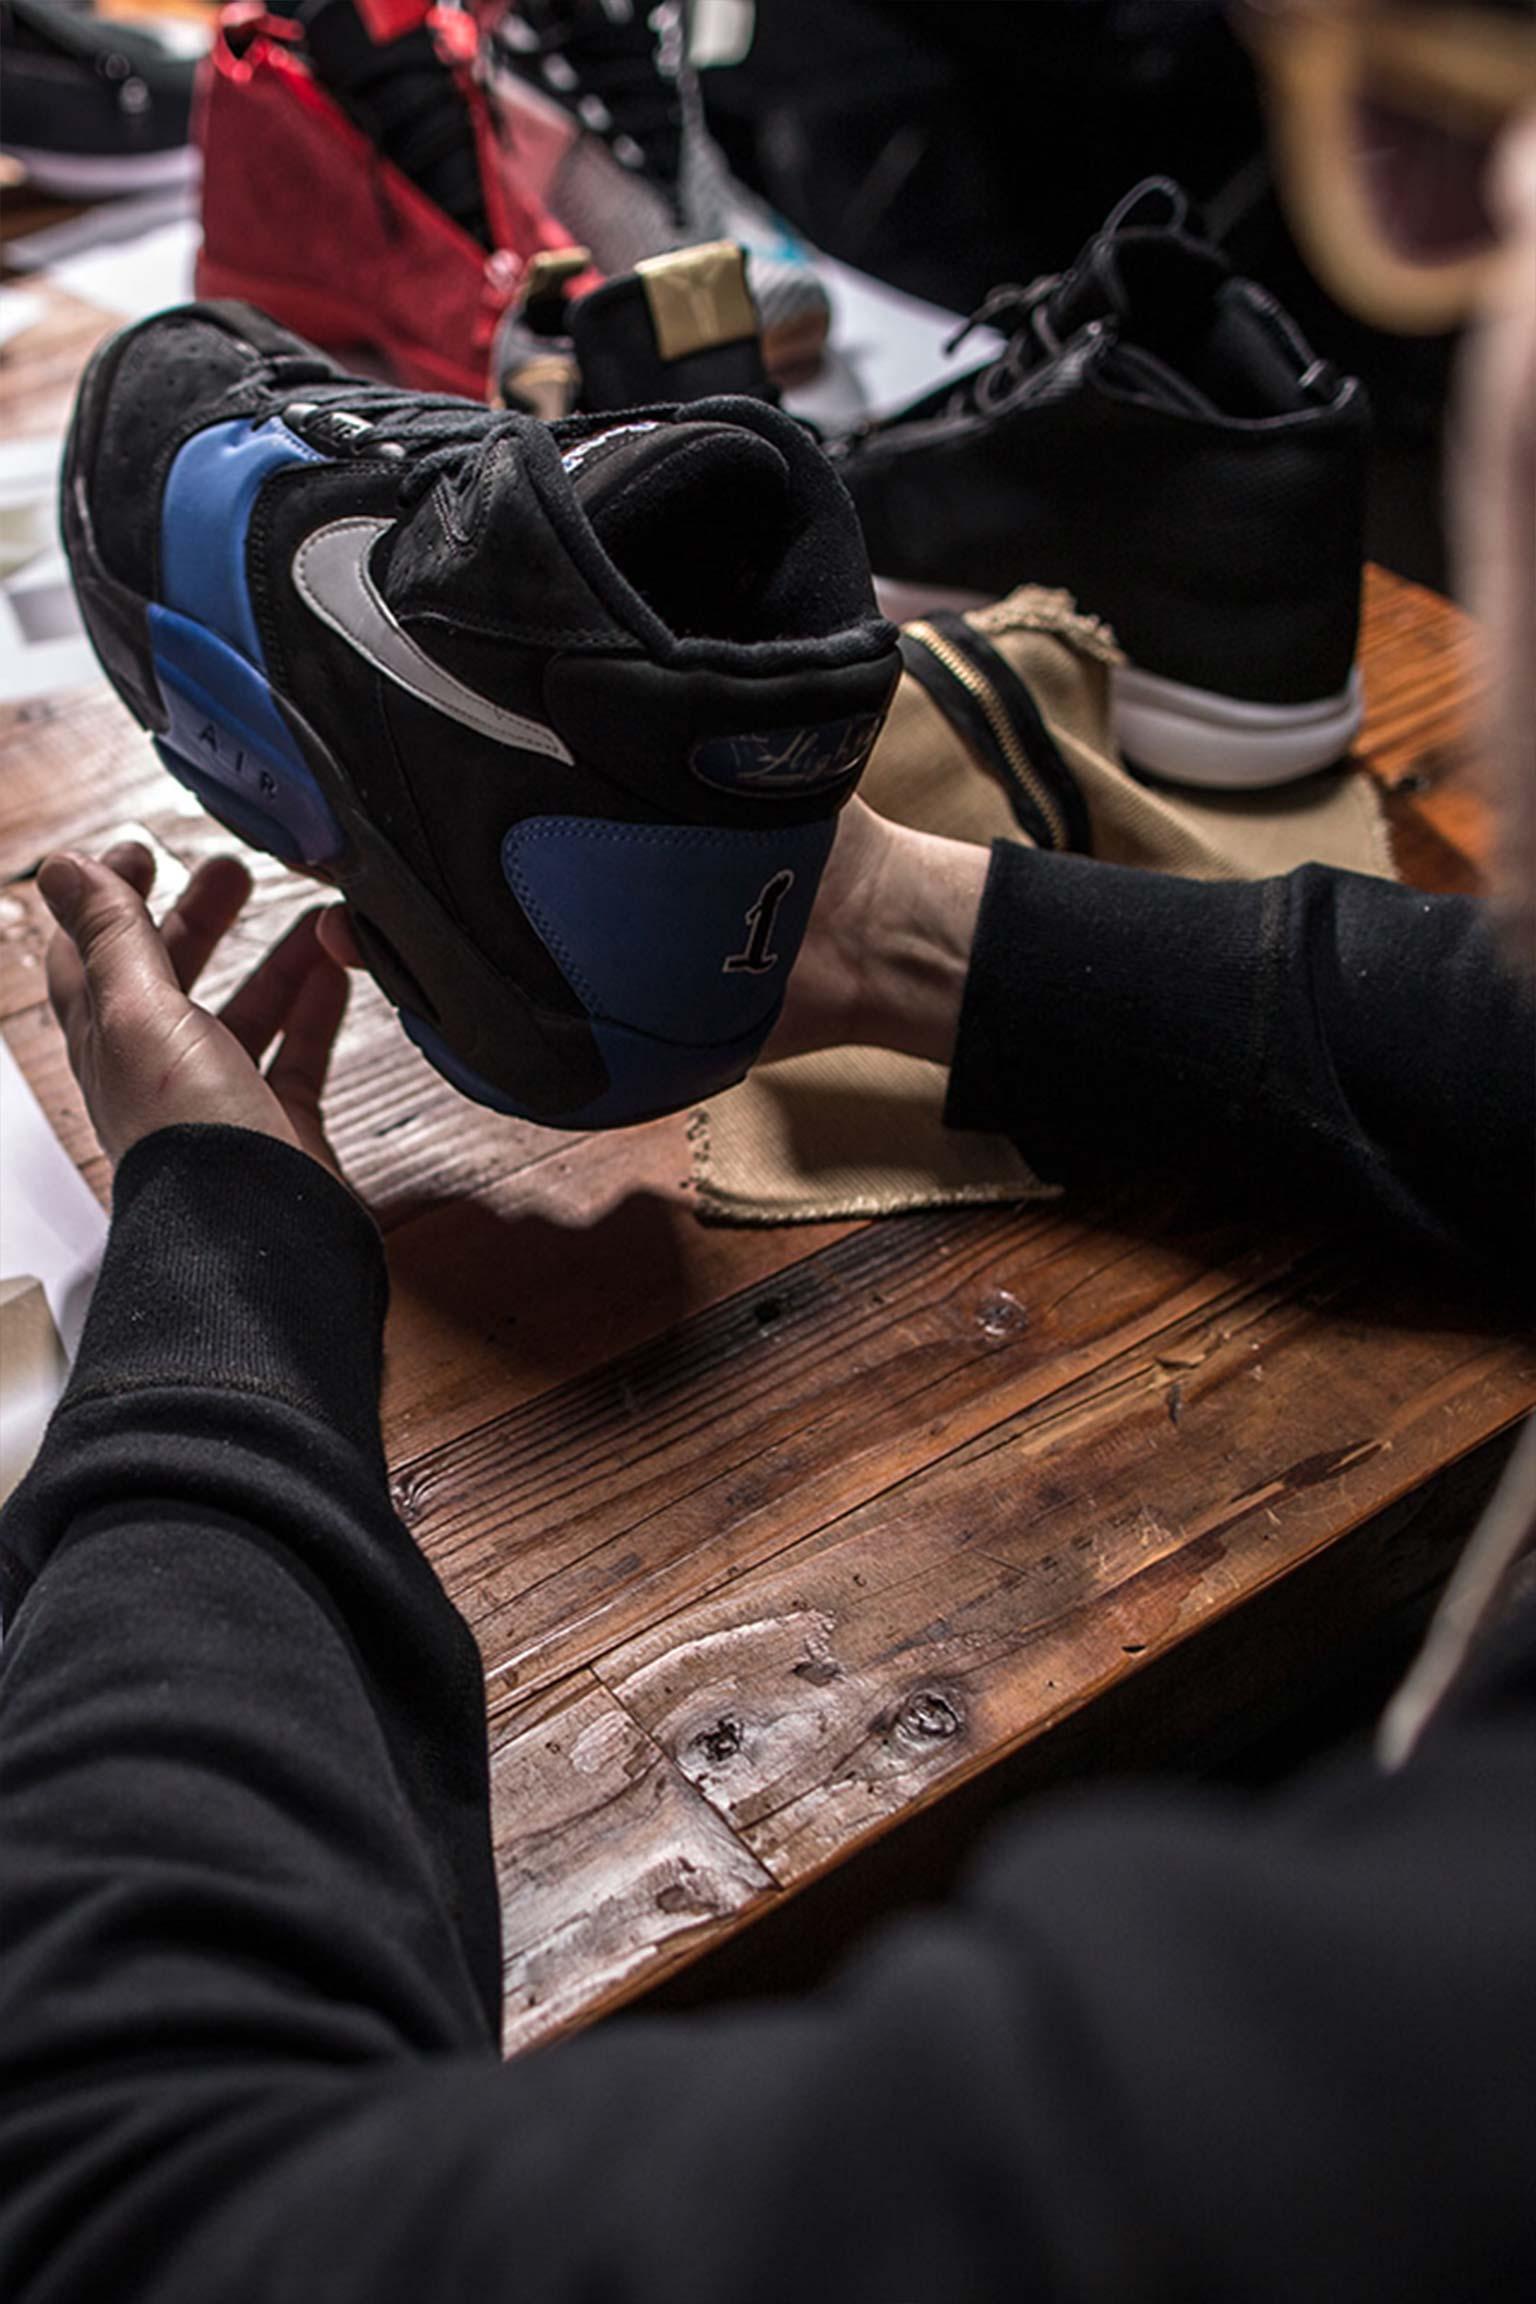 Tajemství designu: Nike Zoom Kobe Icon